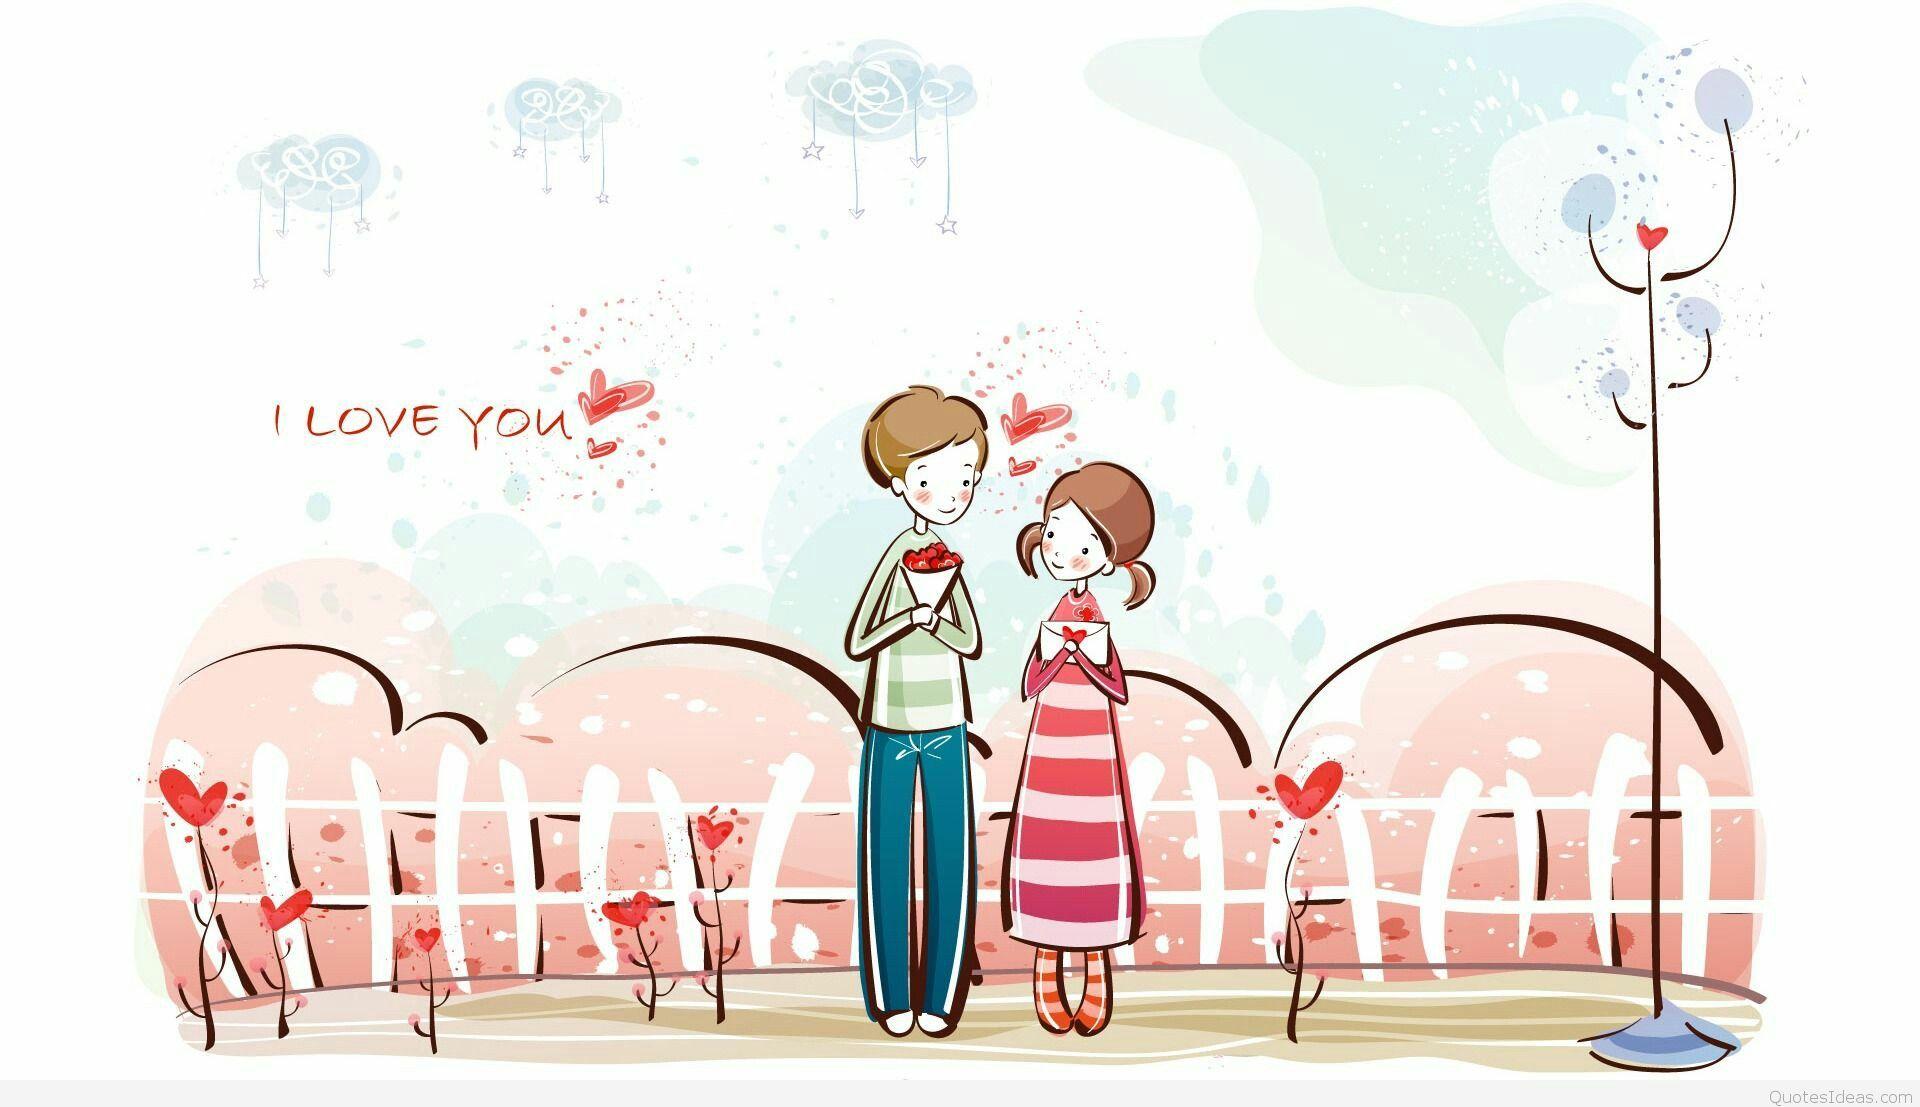 Wonderful Wallpaper I Love You Cartoon - 6fe6b02169dcbfba3dc17e51e8510979  Snapshot_84851   .jpg